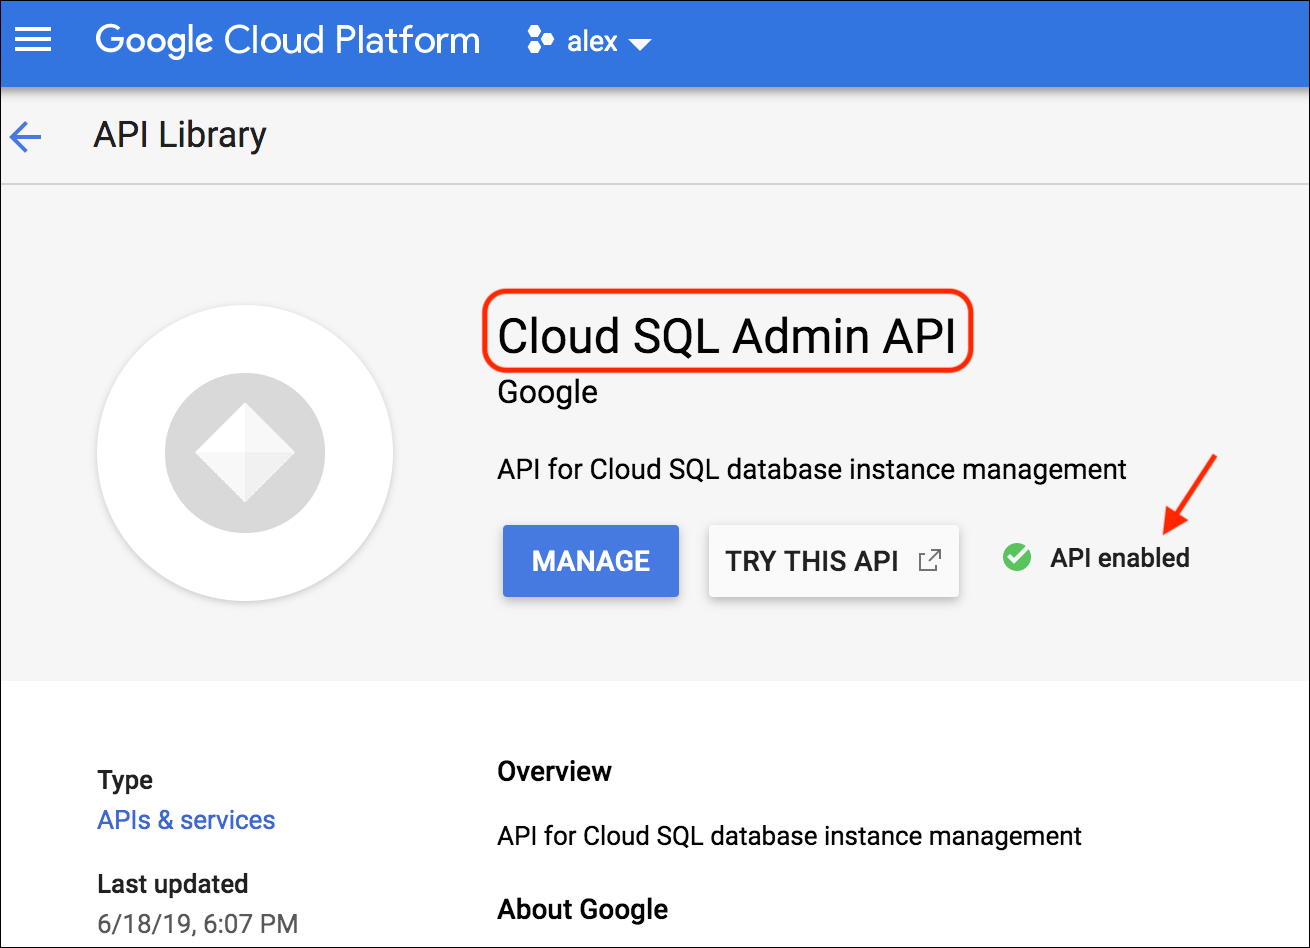 Cloud SQL Admin API (API Enabled)